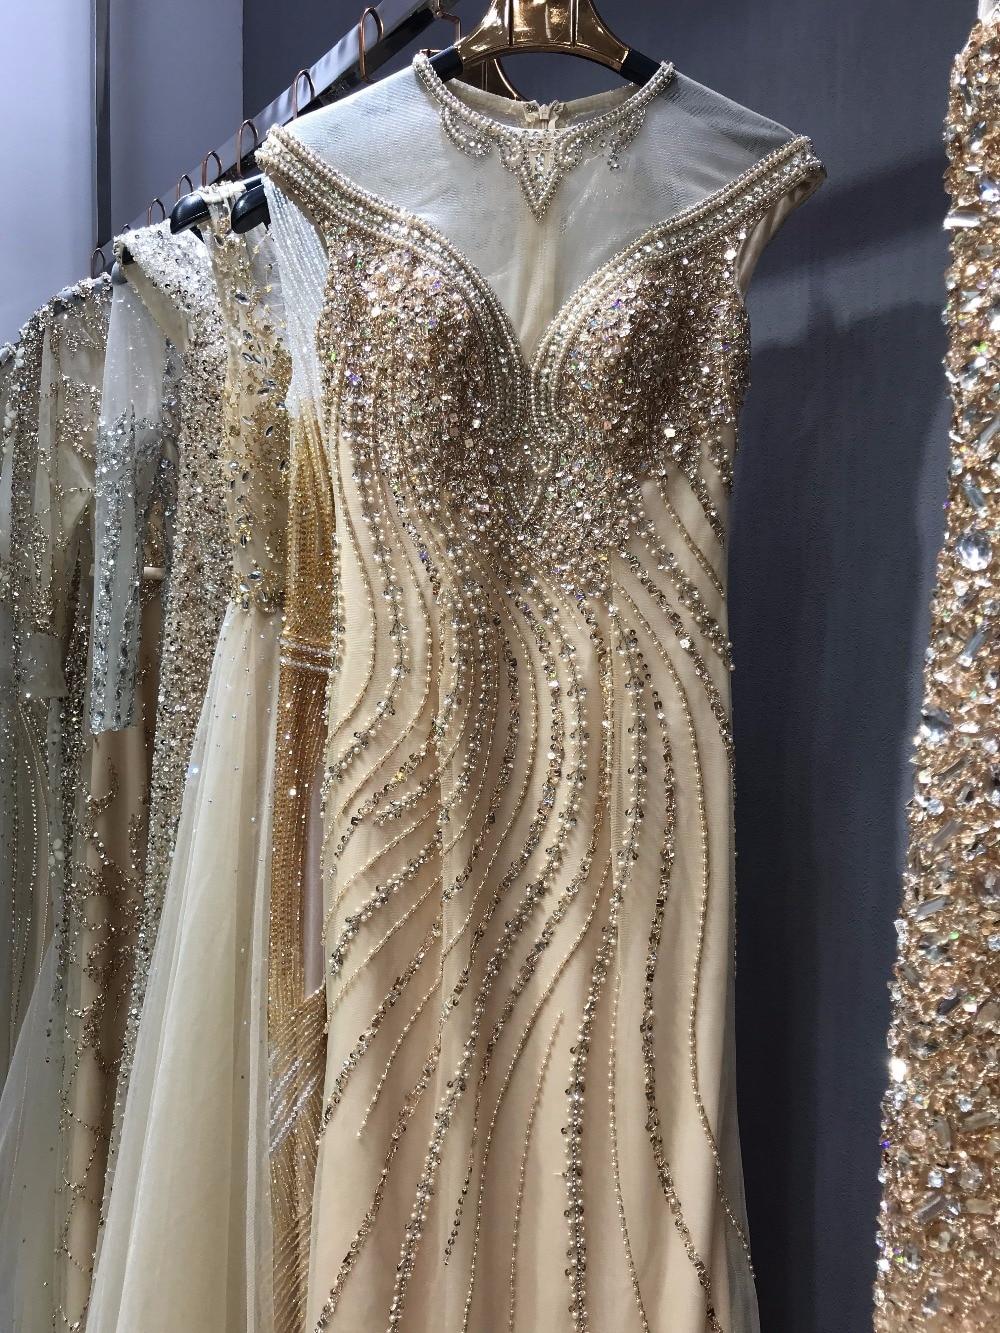 Gold Evening Dresses Walk Beside You Mermaid Beaded Crystal Sleeveless Sukienka Wieczorowa Vestidos Formales Royal Prom Gown